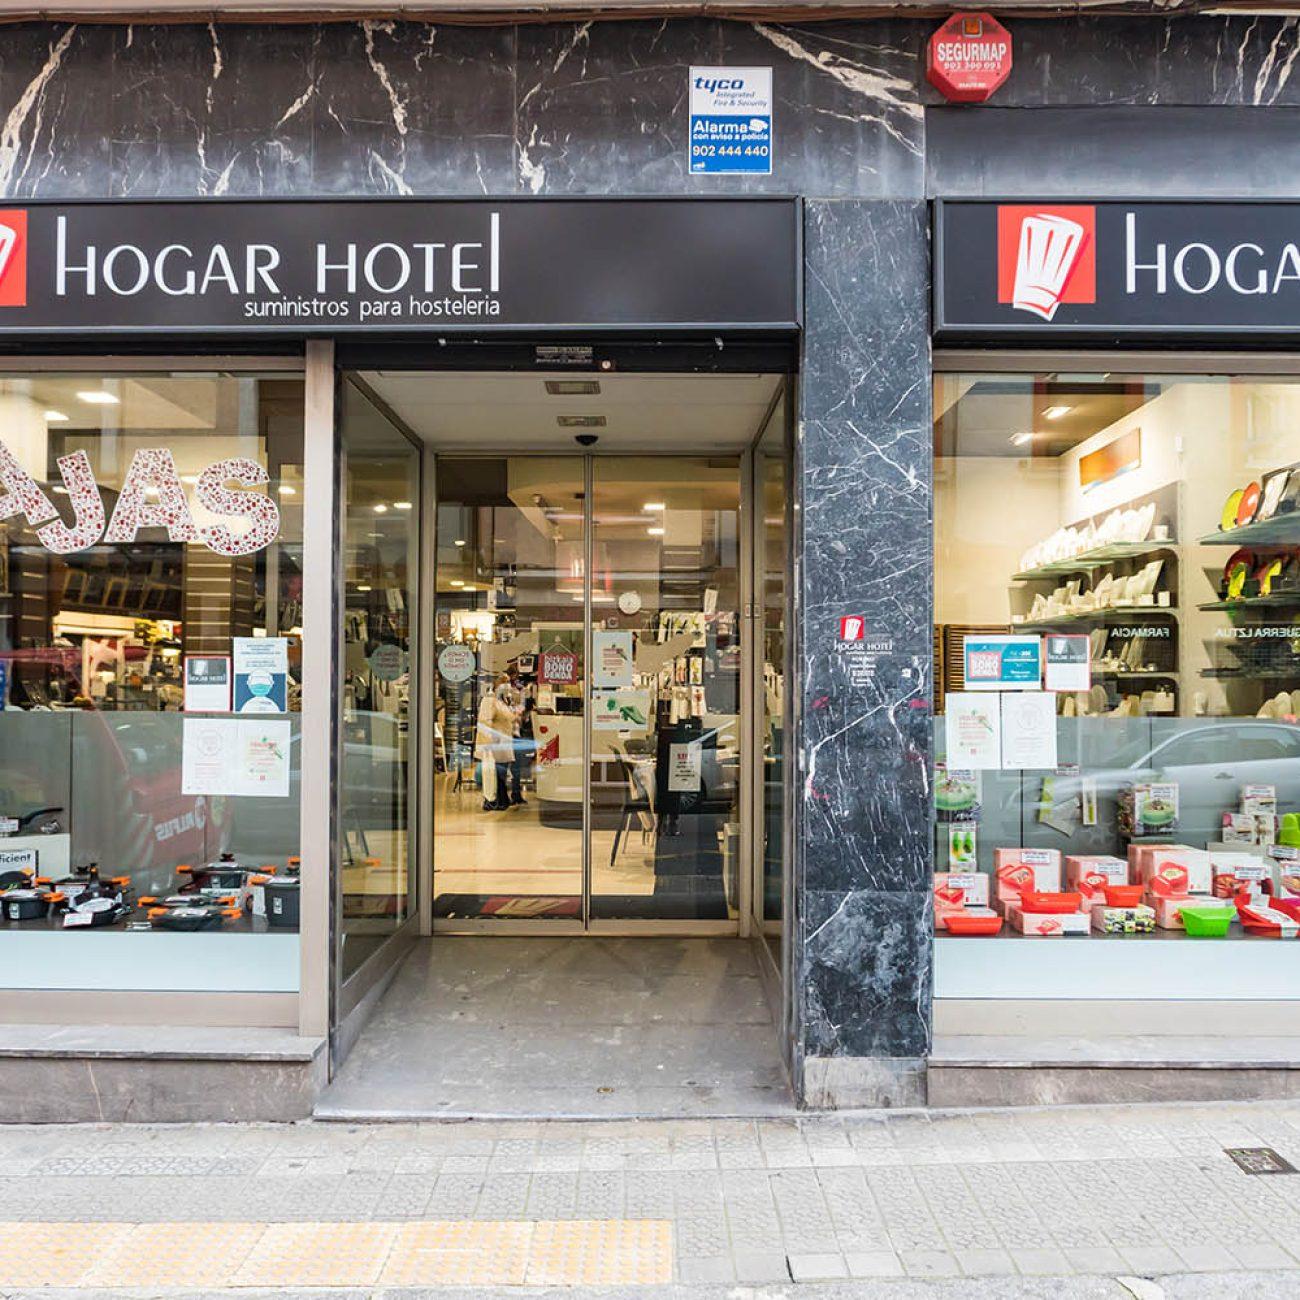 HOGAR HOTEL